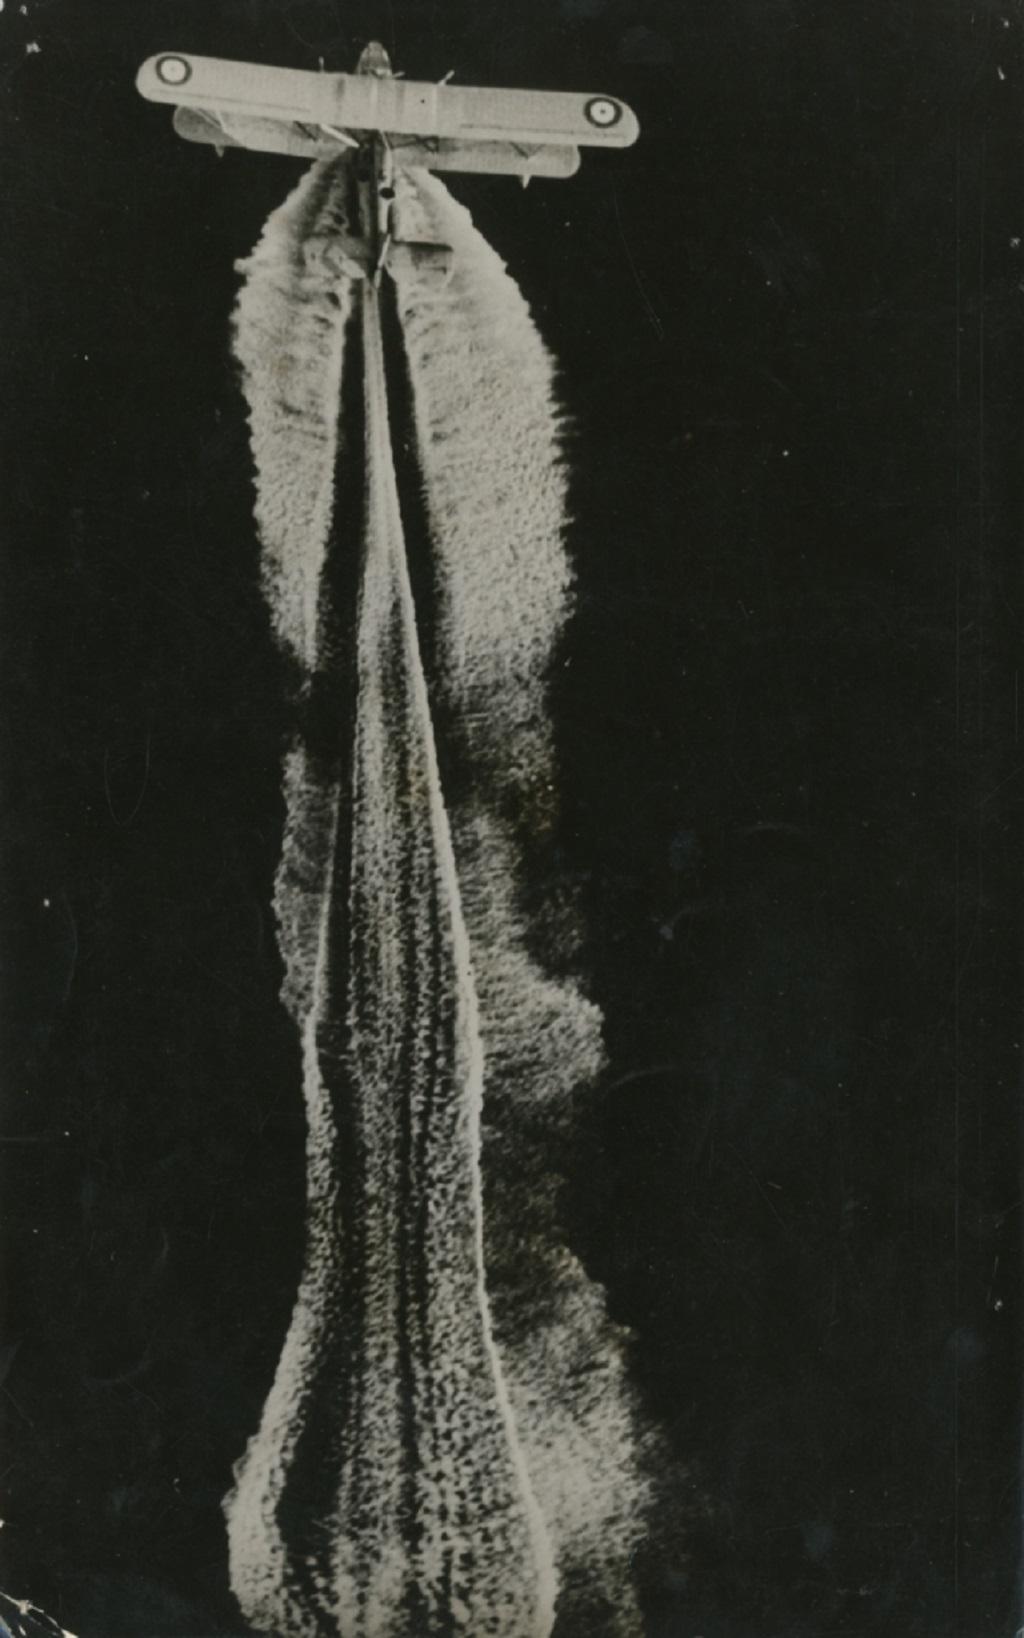 Letadlo od neznámého autora v časopise Ahoj (1930–1949)